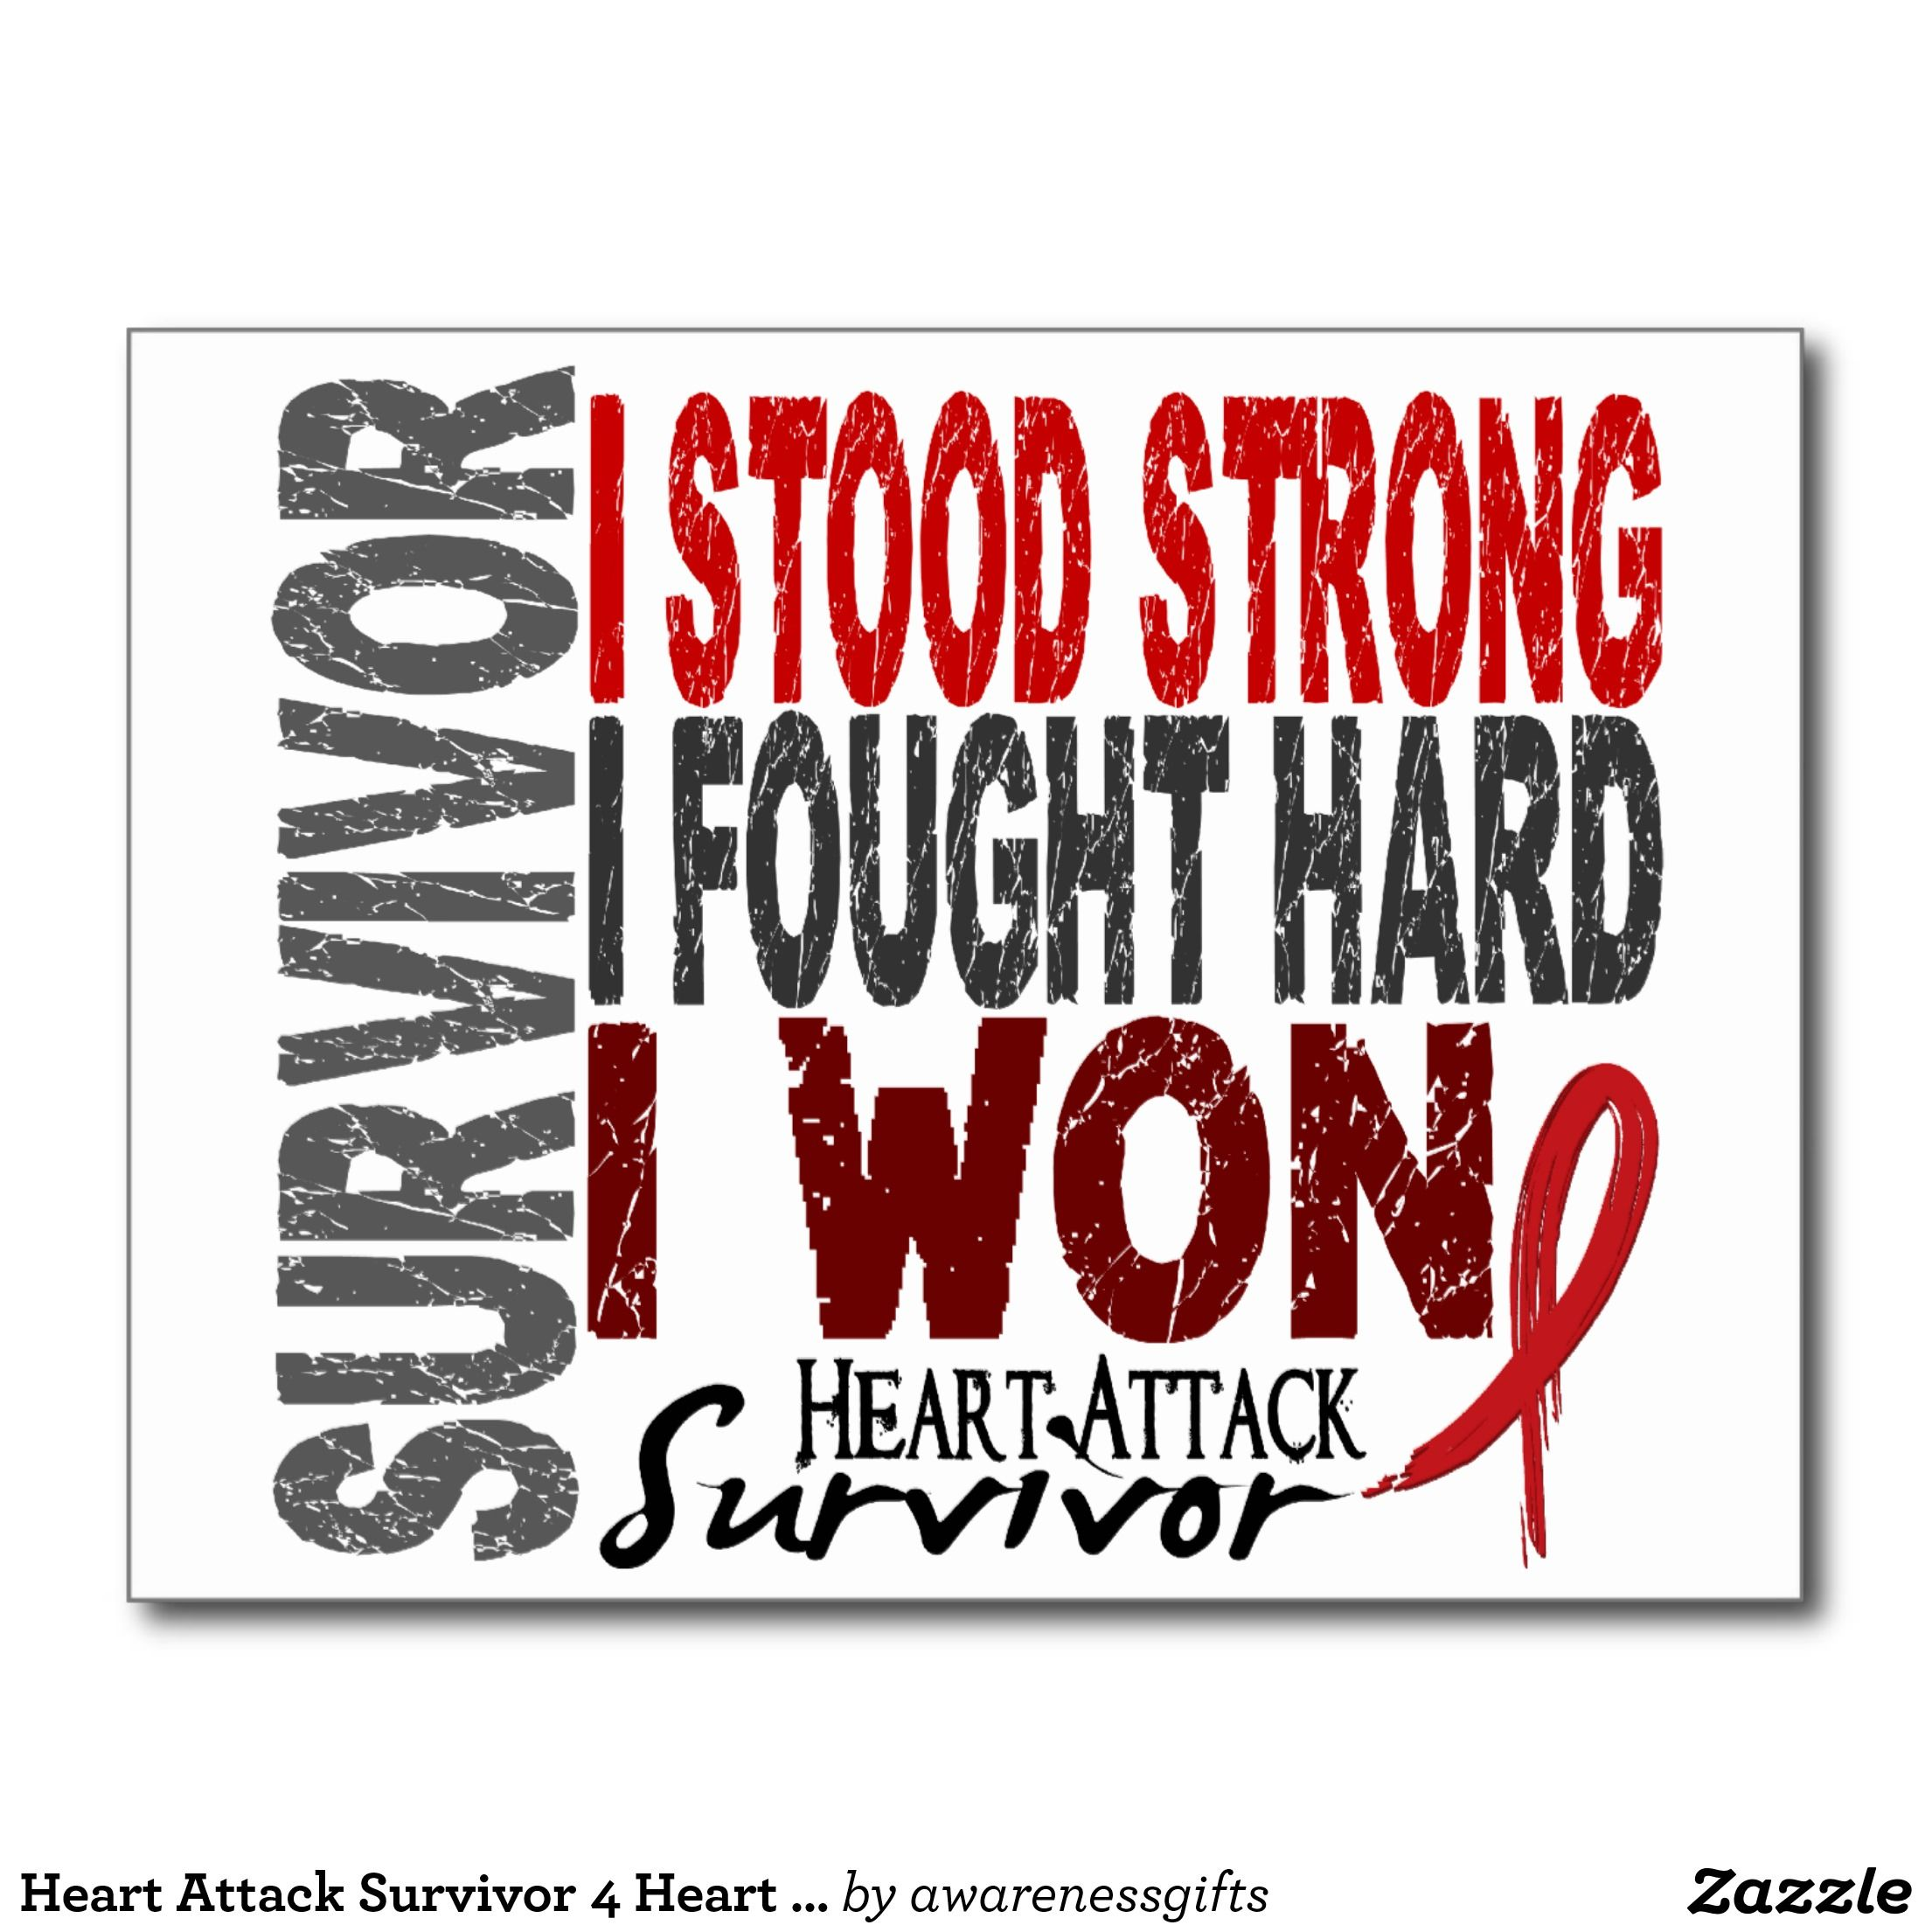 Heart Attack Survivor 4 Heart Disease Postcard Zazzle Com Au Heart Attack Heart Disease Awareness Cancer Poster